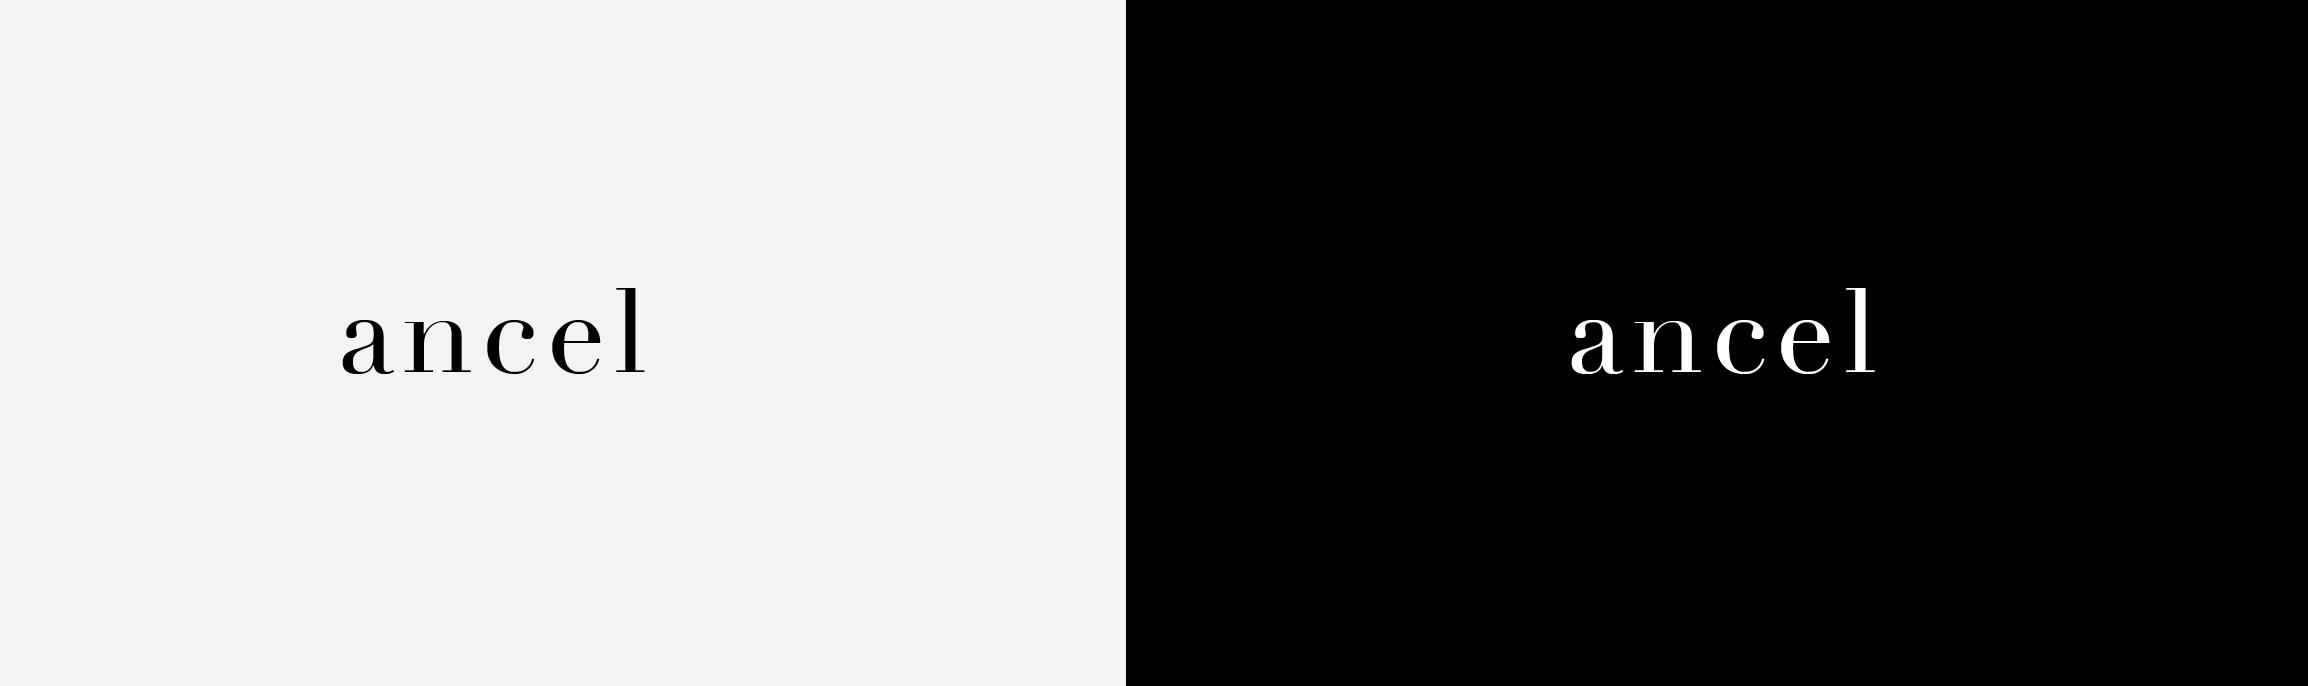 Screenshot 2017-11-13 17.36.00.png